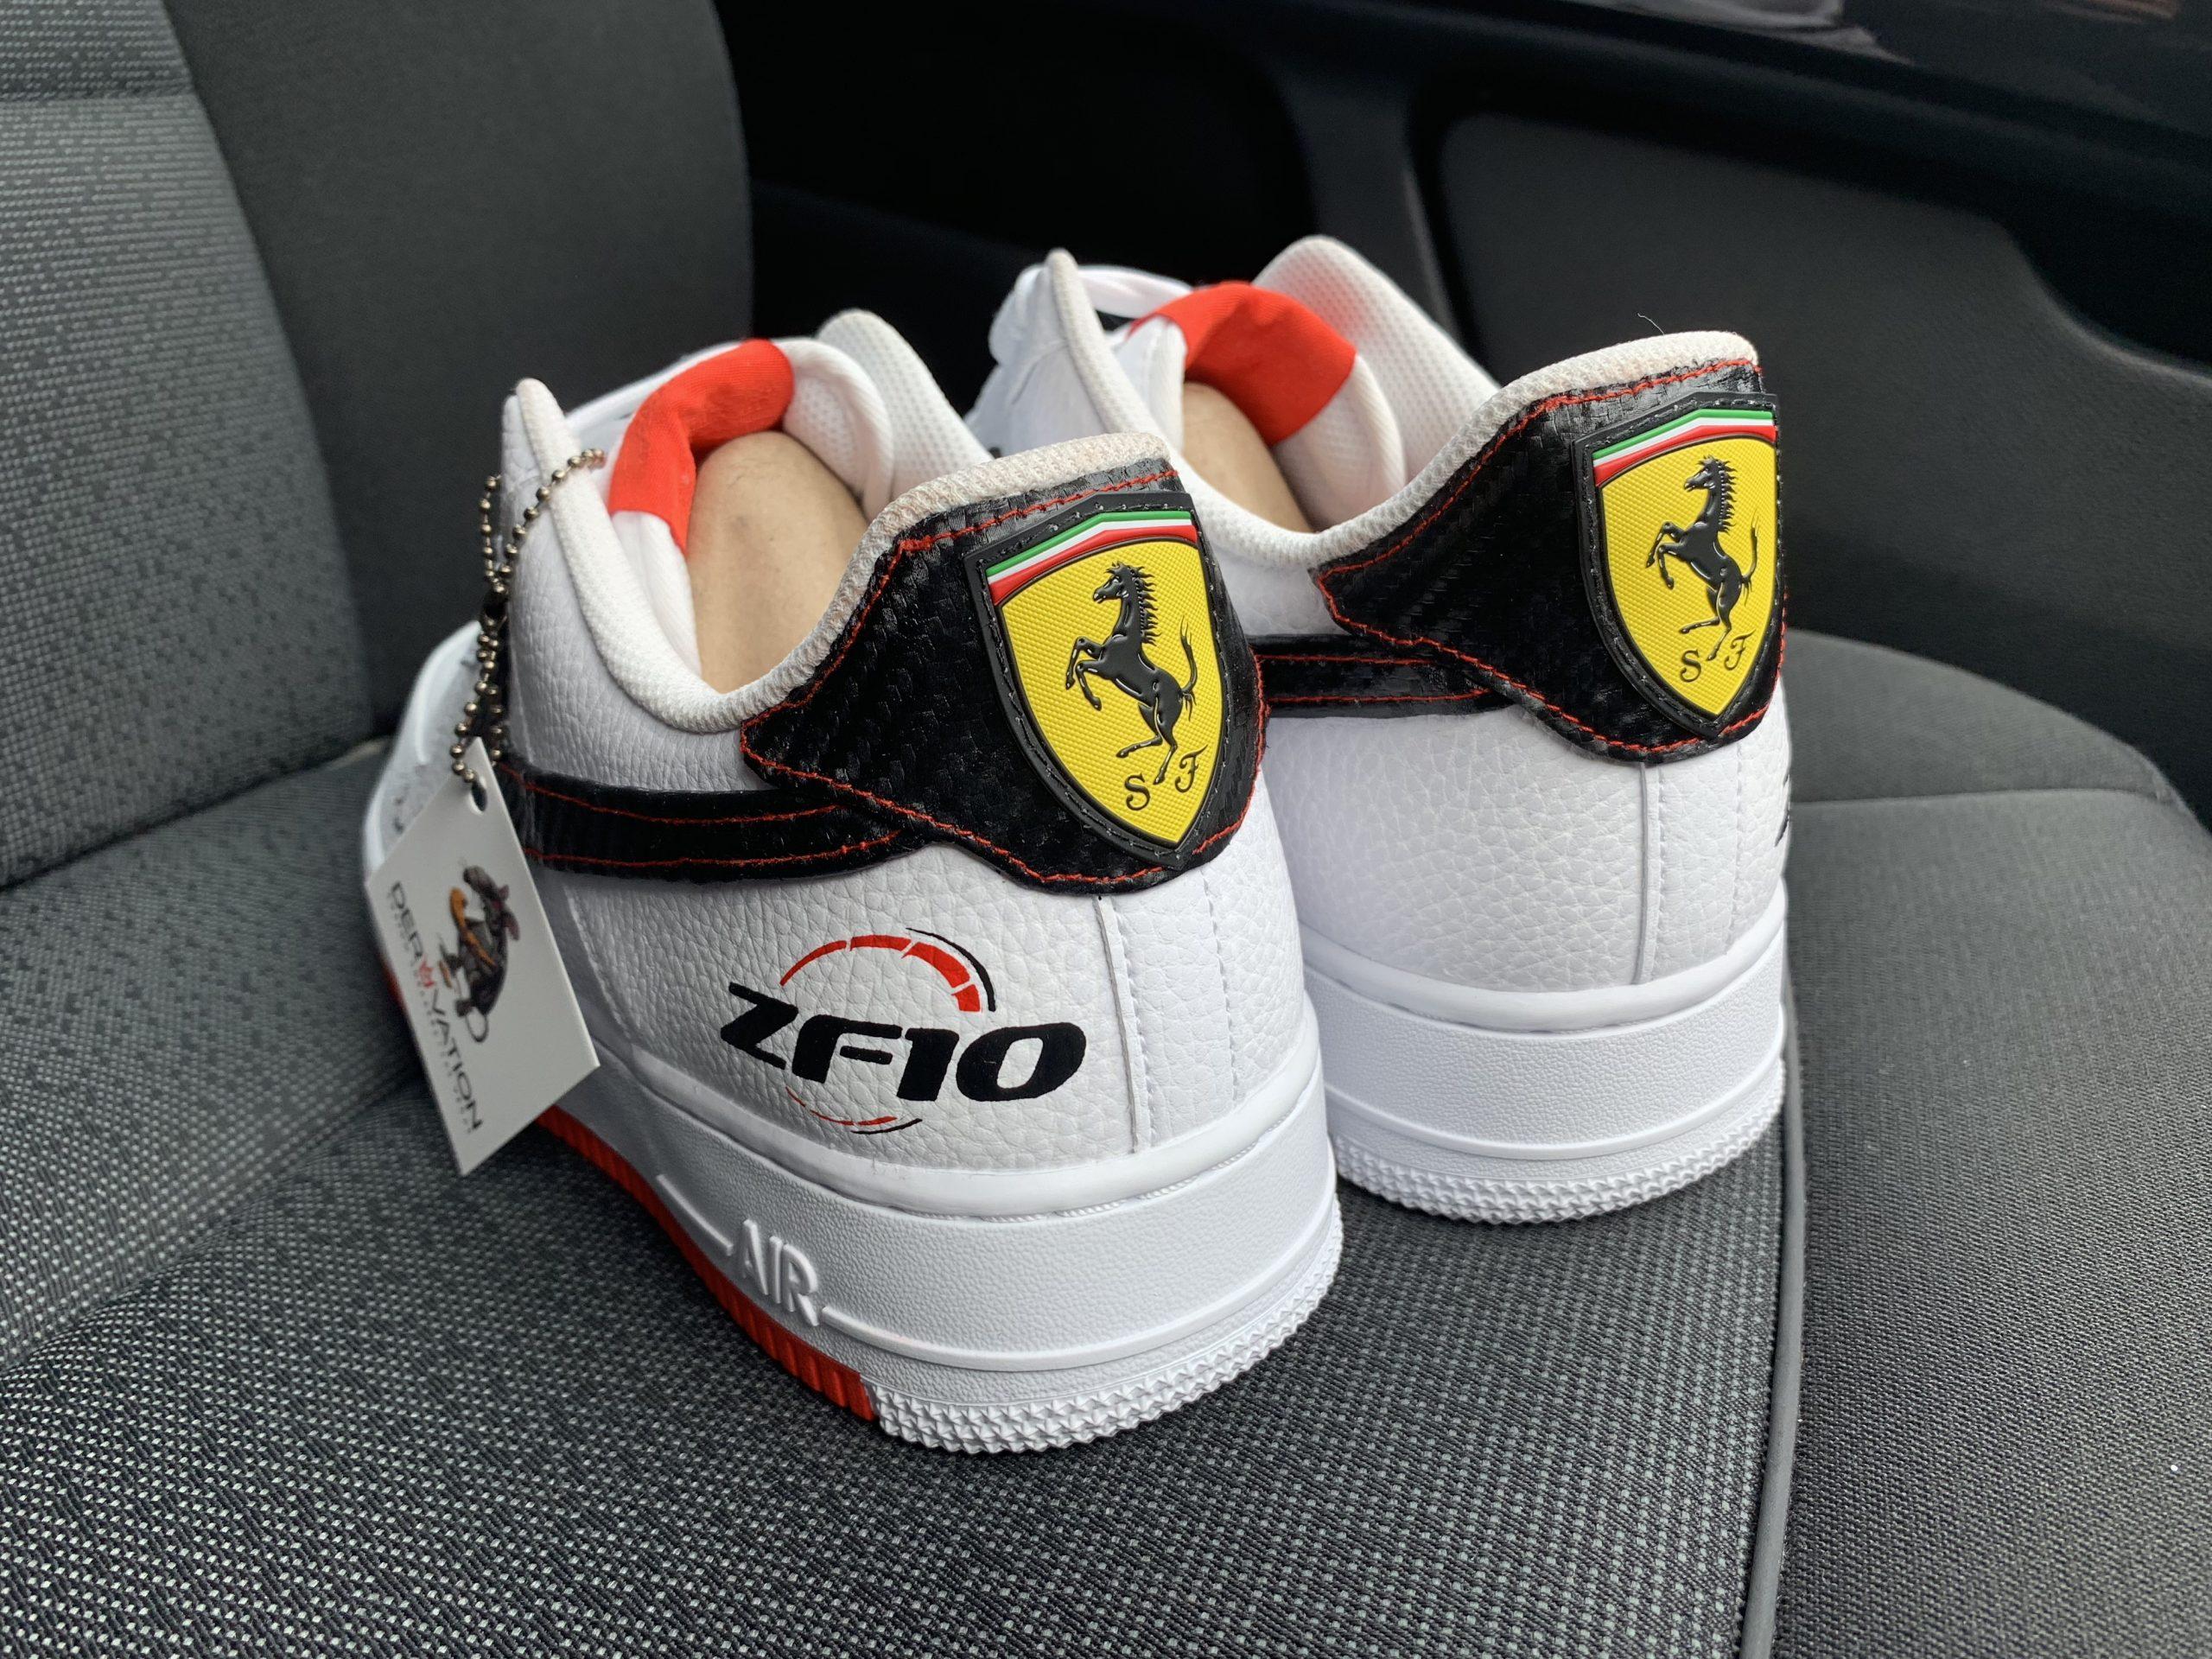 Custom Ferrari 19 Air Force 1 Derivation Customs Custom Sneakers Swarovski Trainers